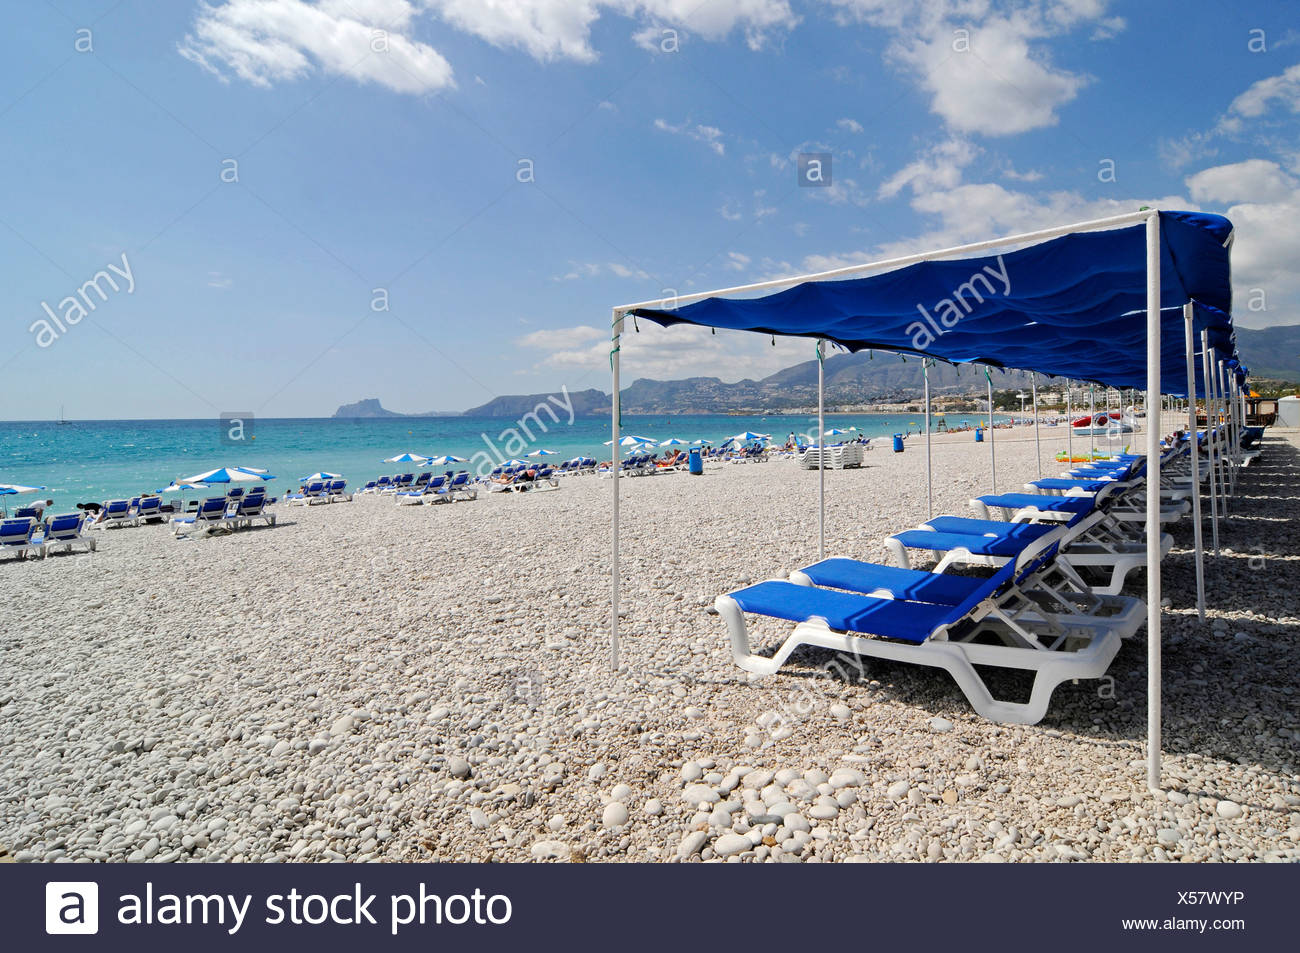 Empty blue chairs, umbrellas, pebble beach, Albir, Altea, Costa Blanca, Alicante, Spain, Europe Stock Photo